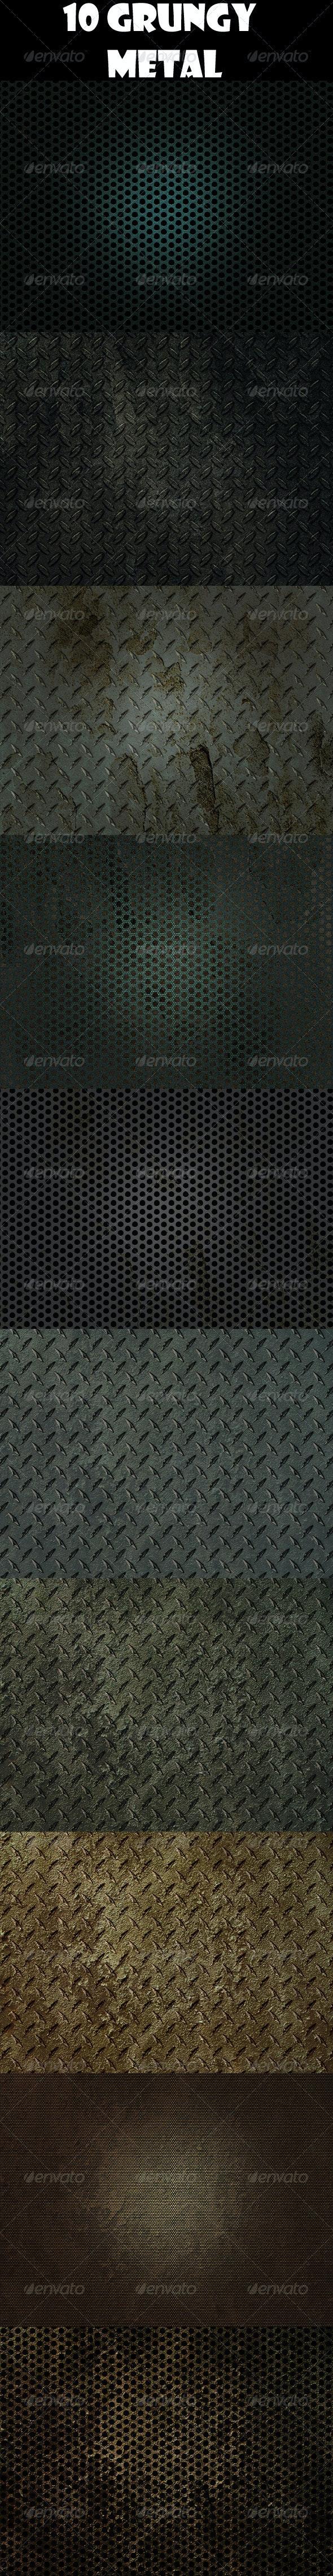 10 Grungy Metals - Industrial / Grunge Textures